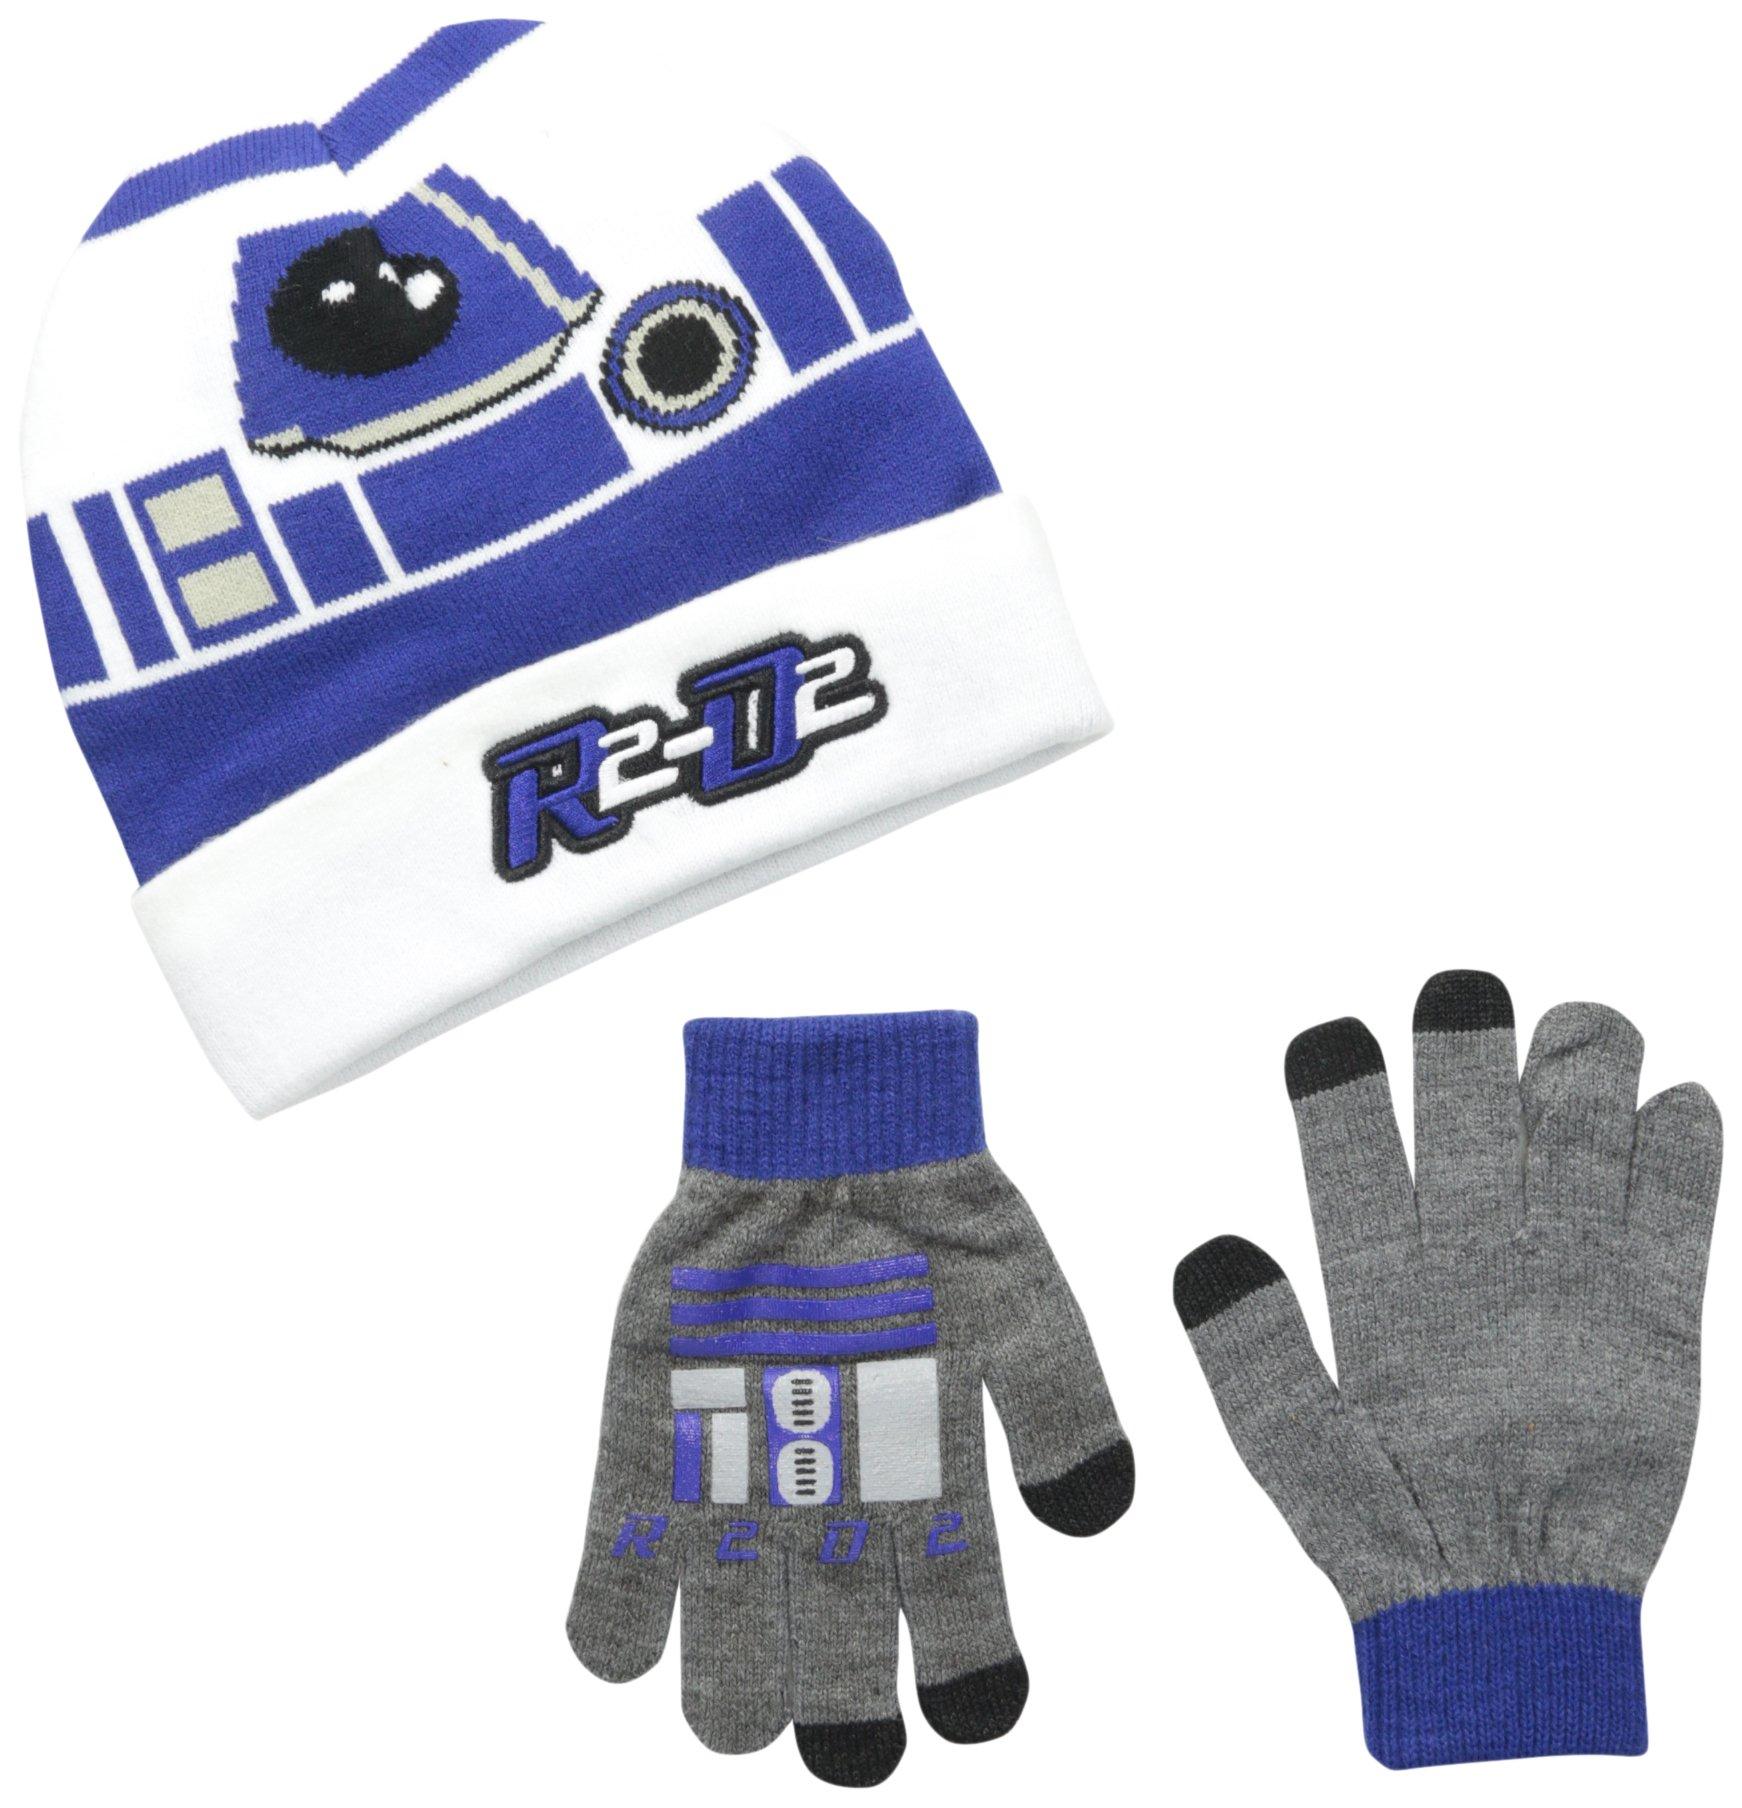 Star Wars Little Boys' R2D2 Cuffed Beanie and Glove Set, White, One Size